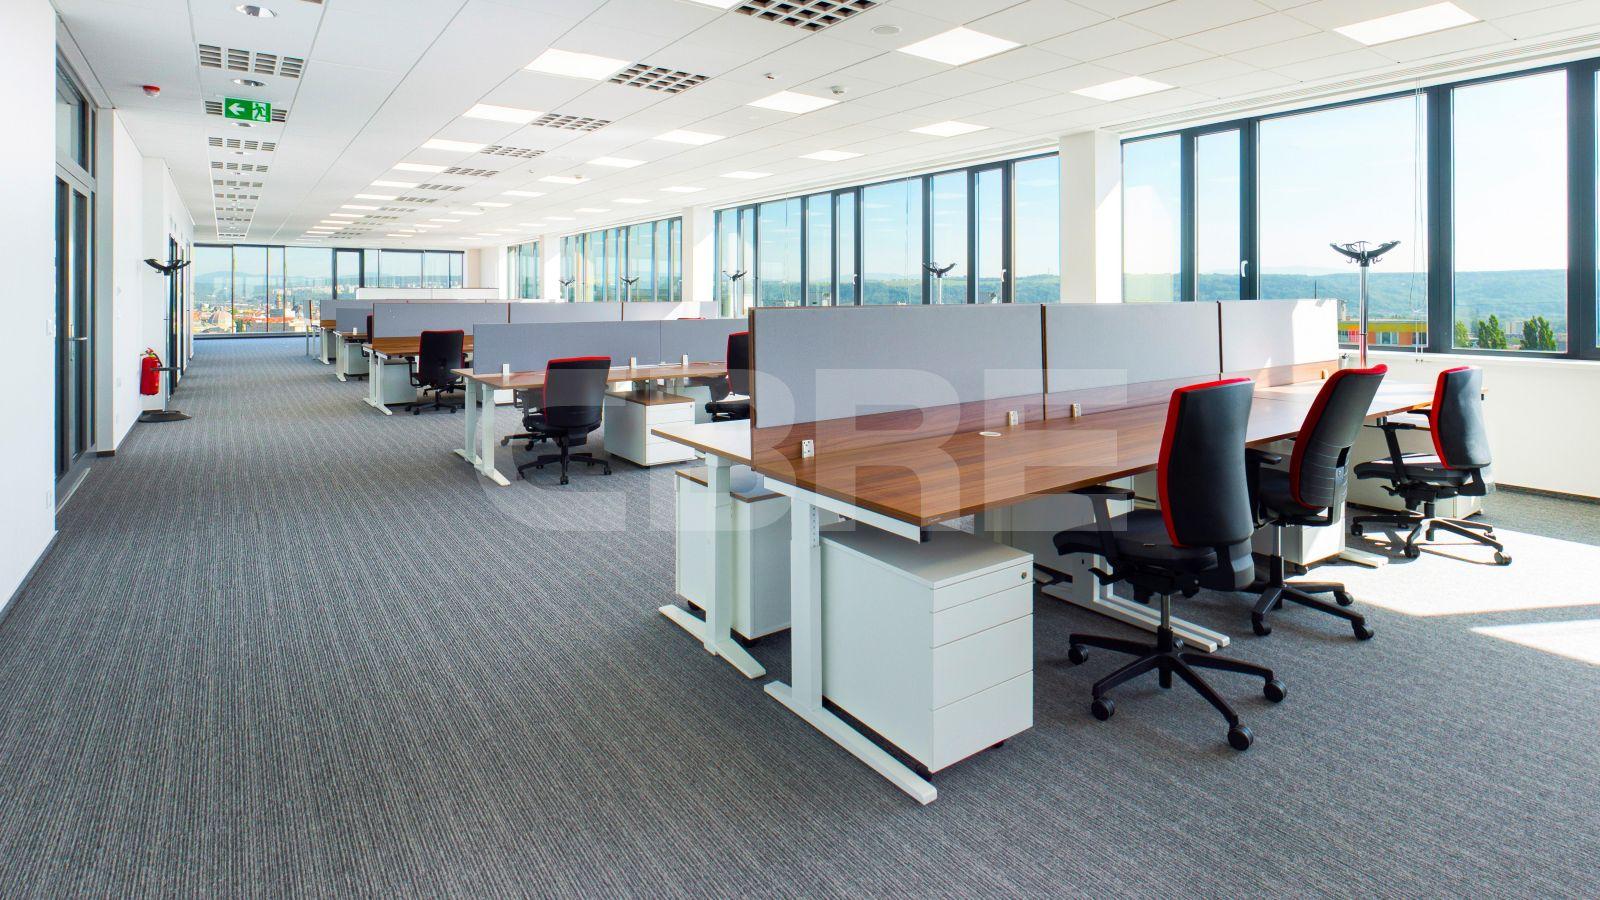 Business Center Tesla II., Košice - Staré Mesto | Offices for rent by CBRE | 2